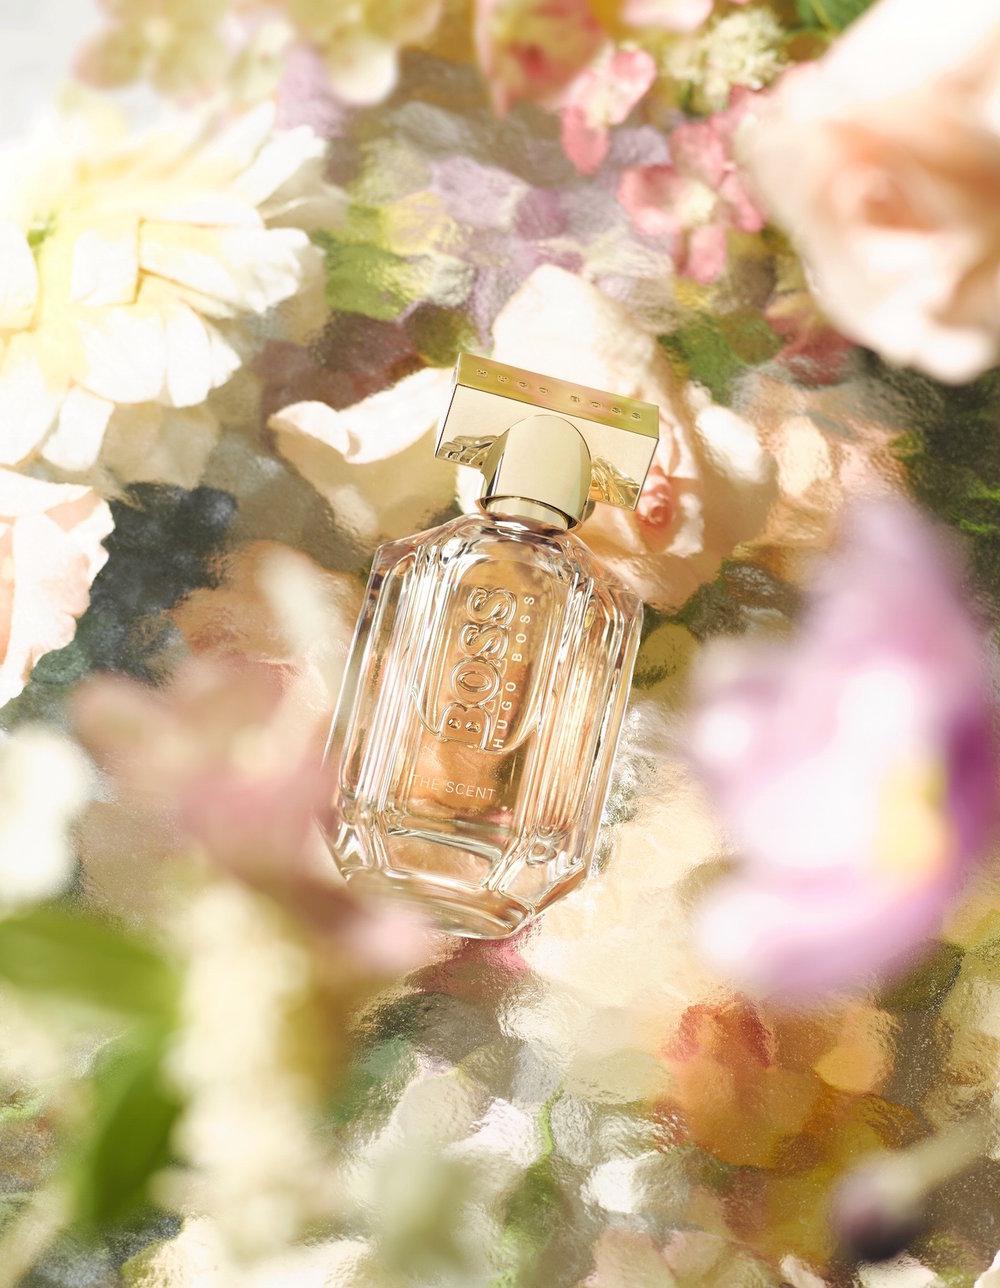 Styling-flowers-fashion-magazine-wonderland.jpg